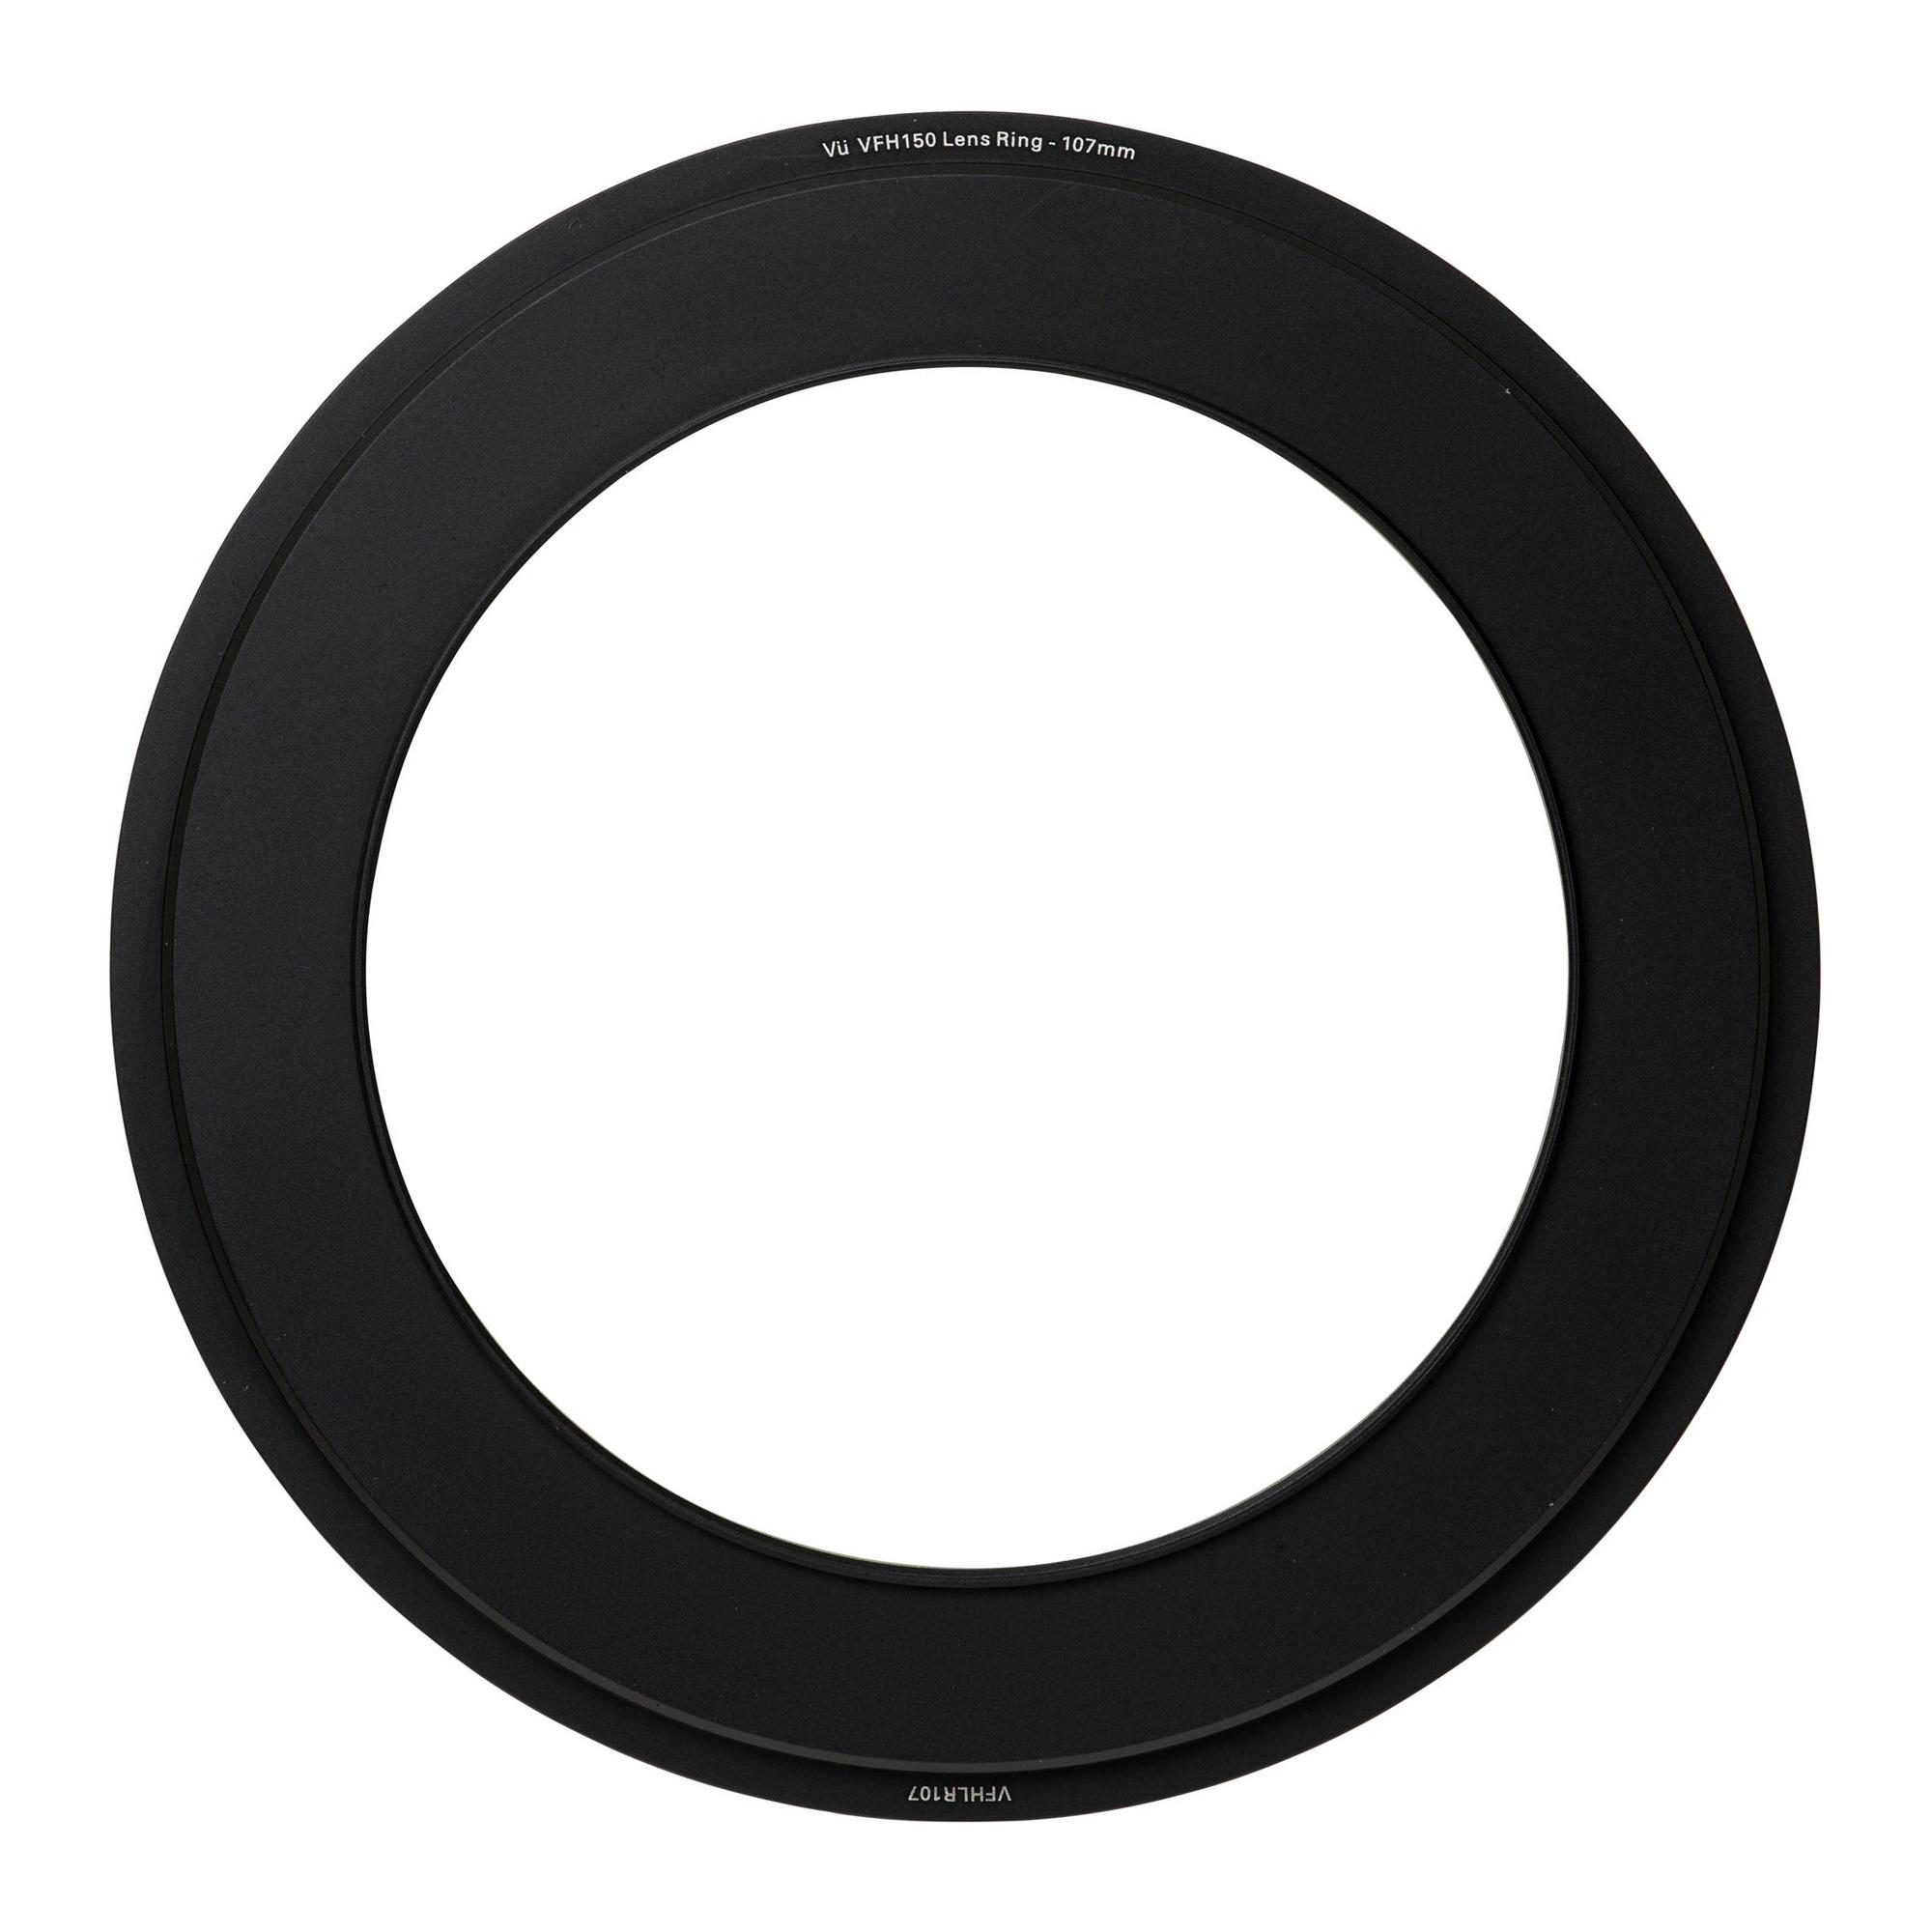 150mm Professional Filter Holder 107mm Lens Ring